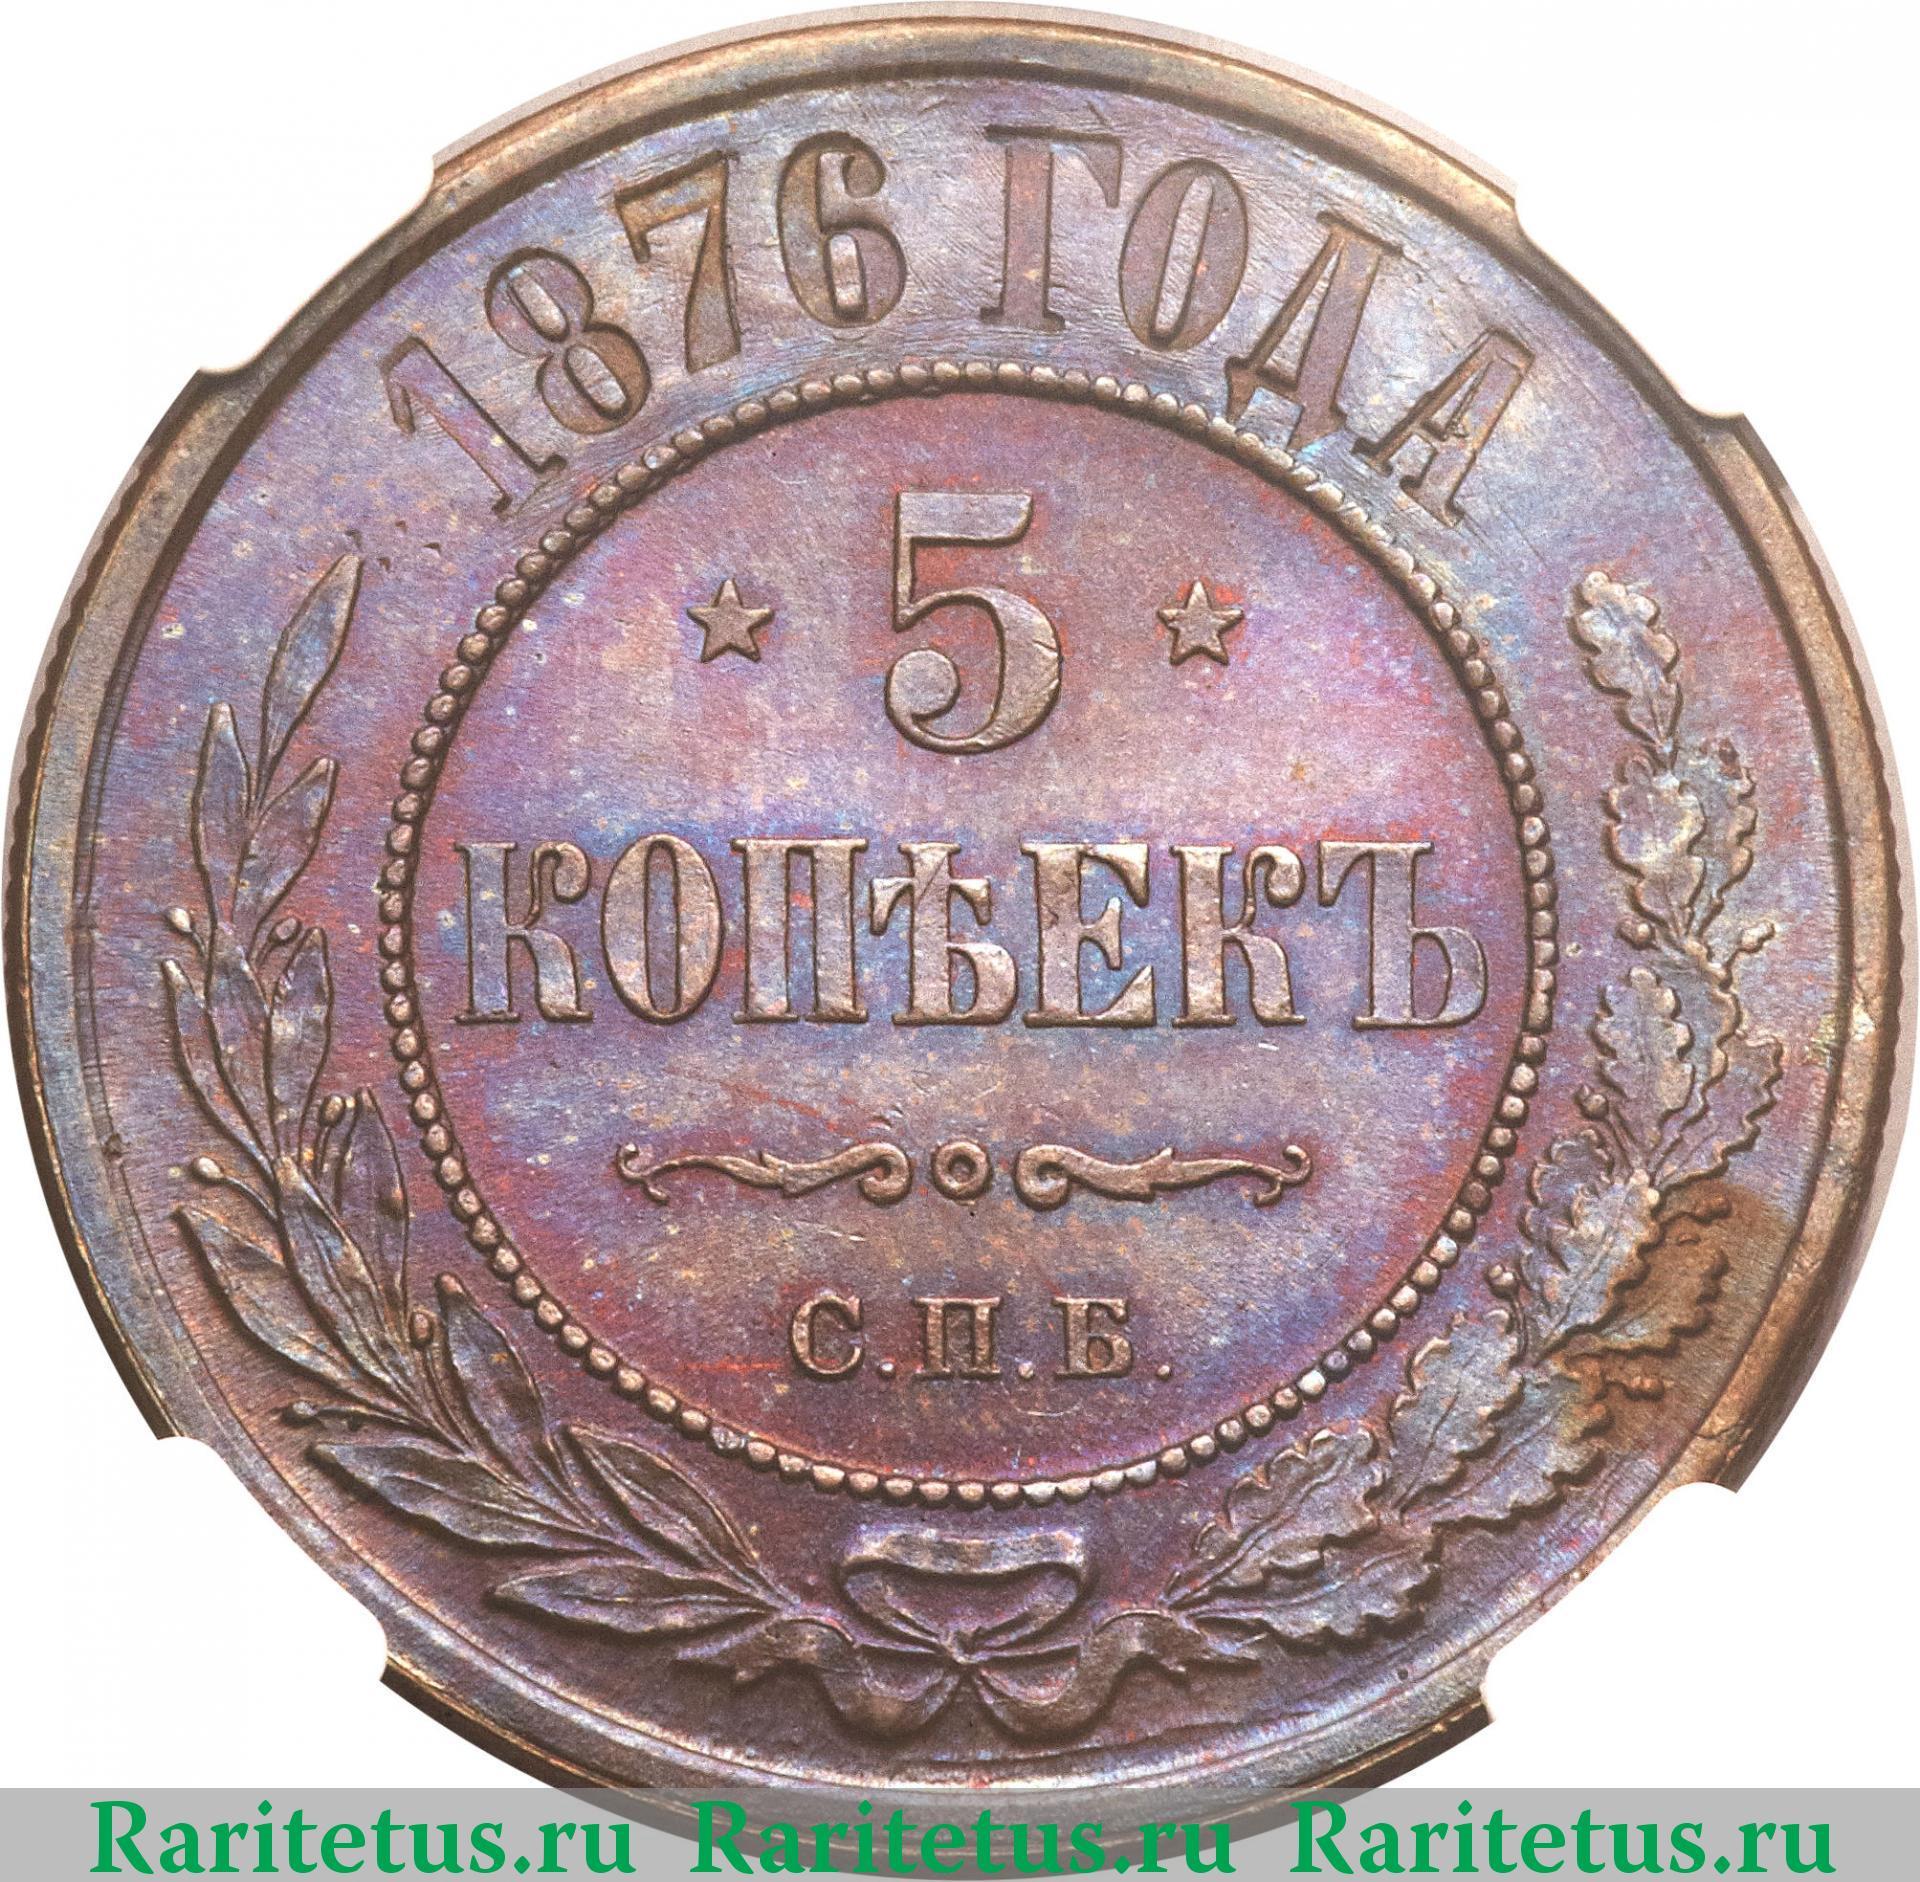 Монета 5 копеек 1876 года цена монеты втб